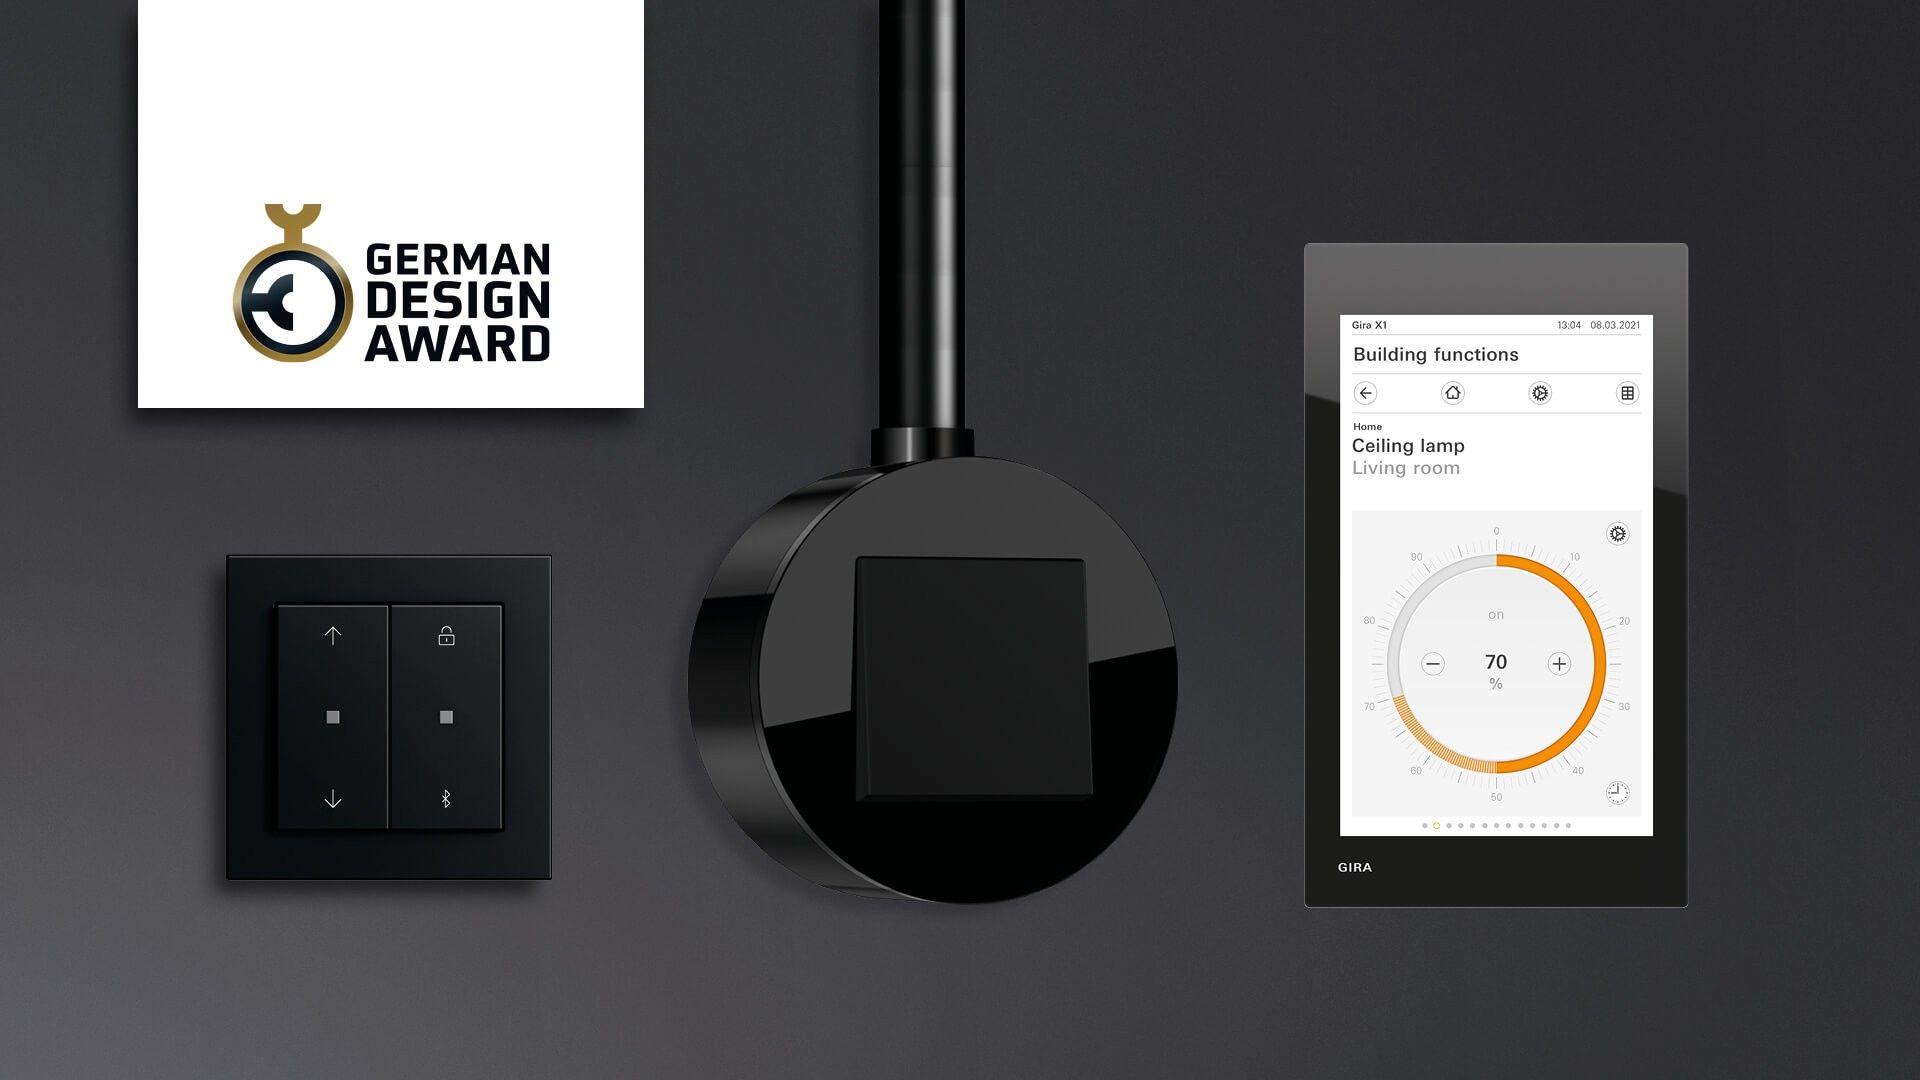 German Design Award Gira winner